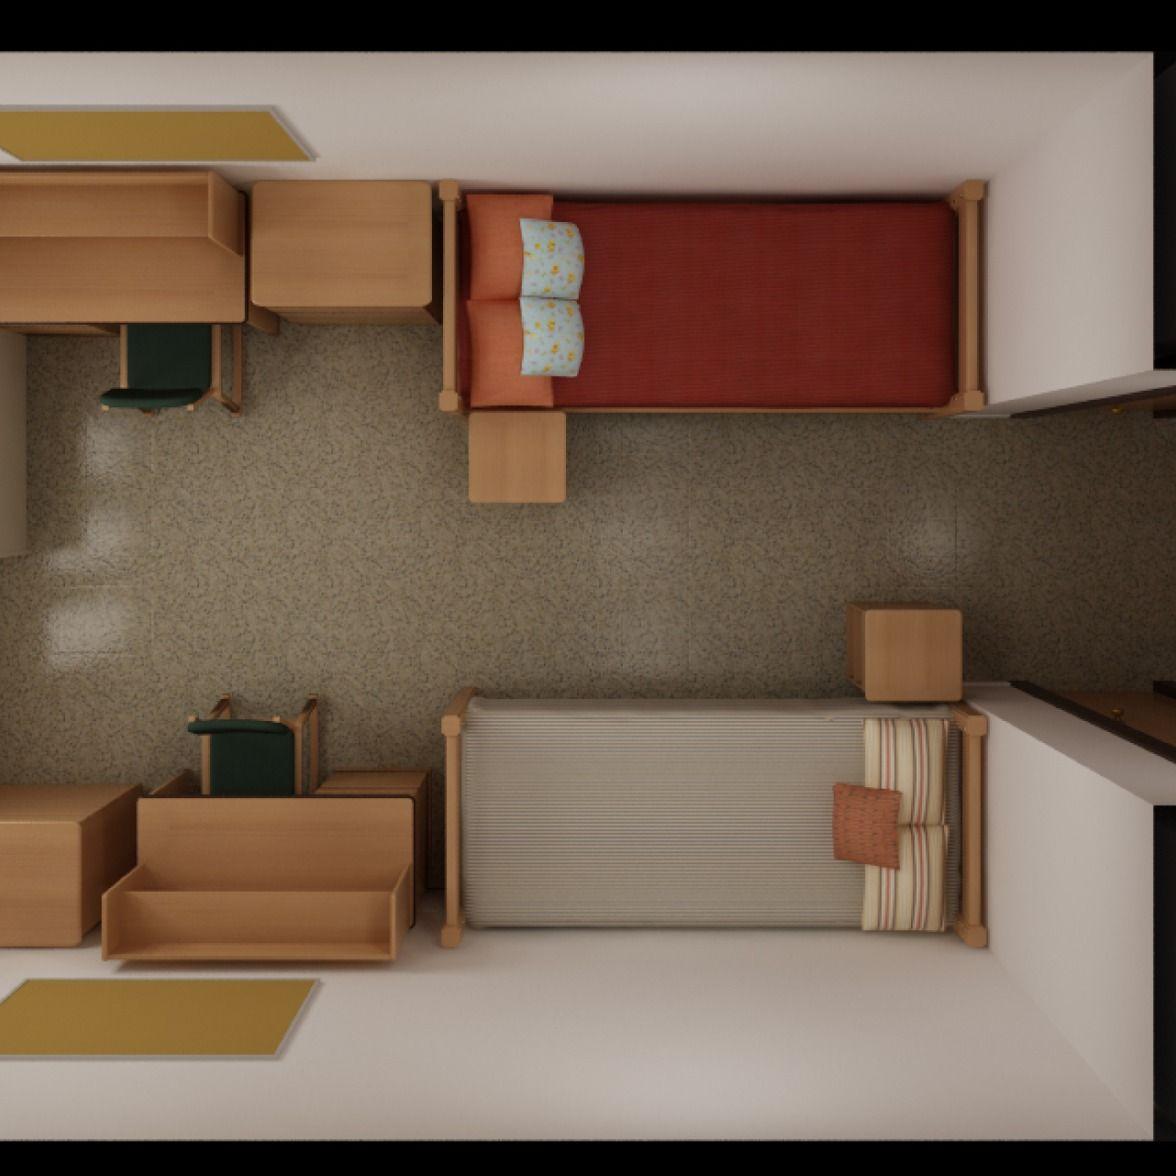 Texas State Laurel Hall Floor Plan Bedroom Size 10 X 13 Window Size 73 X 63 Extra Long Twin Beautiful Dorm Room Dorm Room Layouts Texas State Dorm